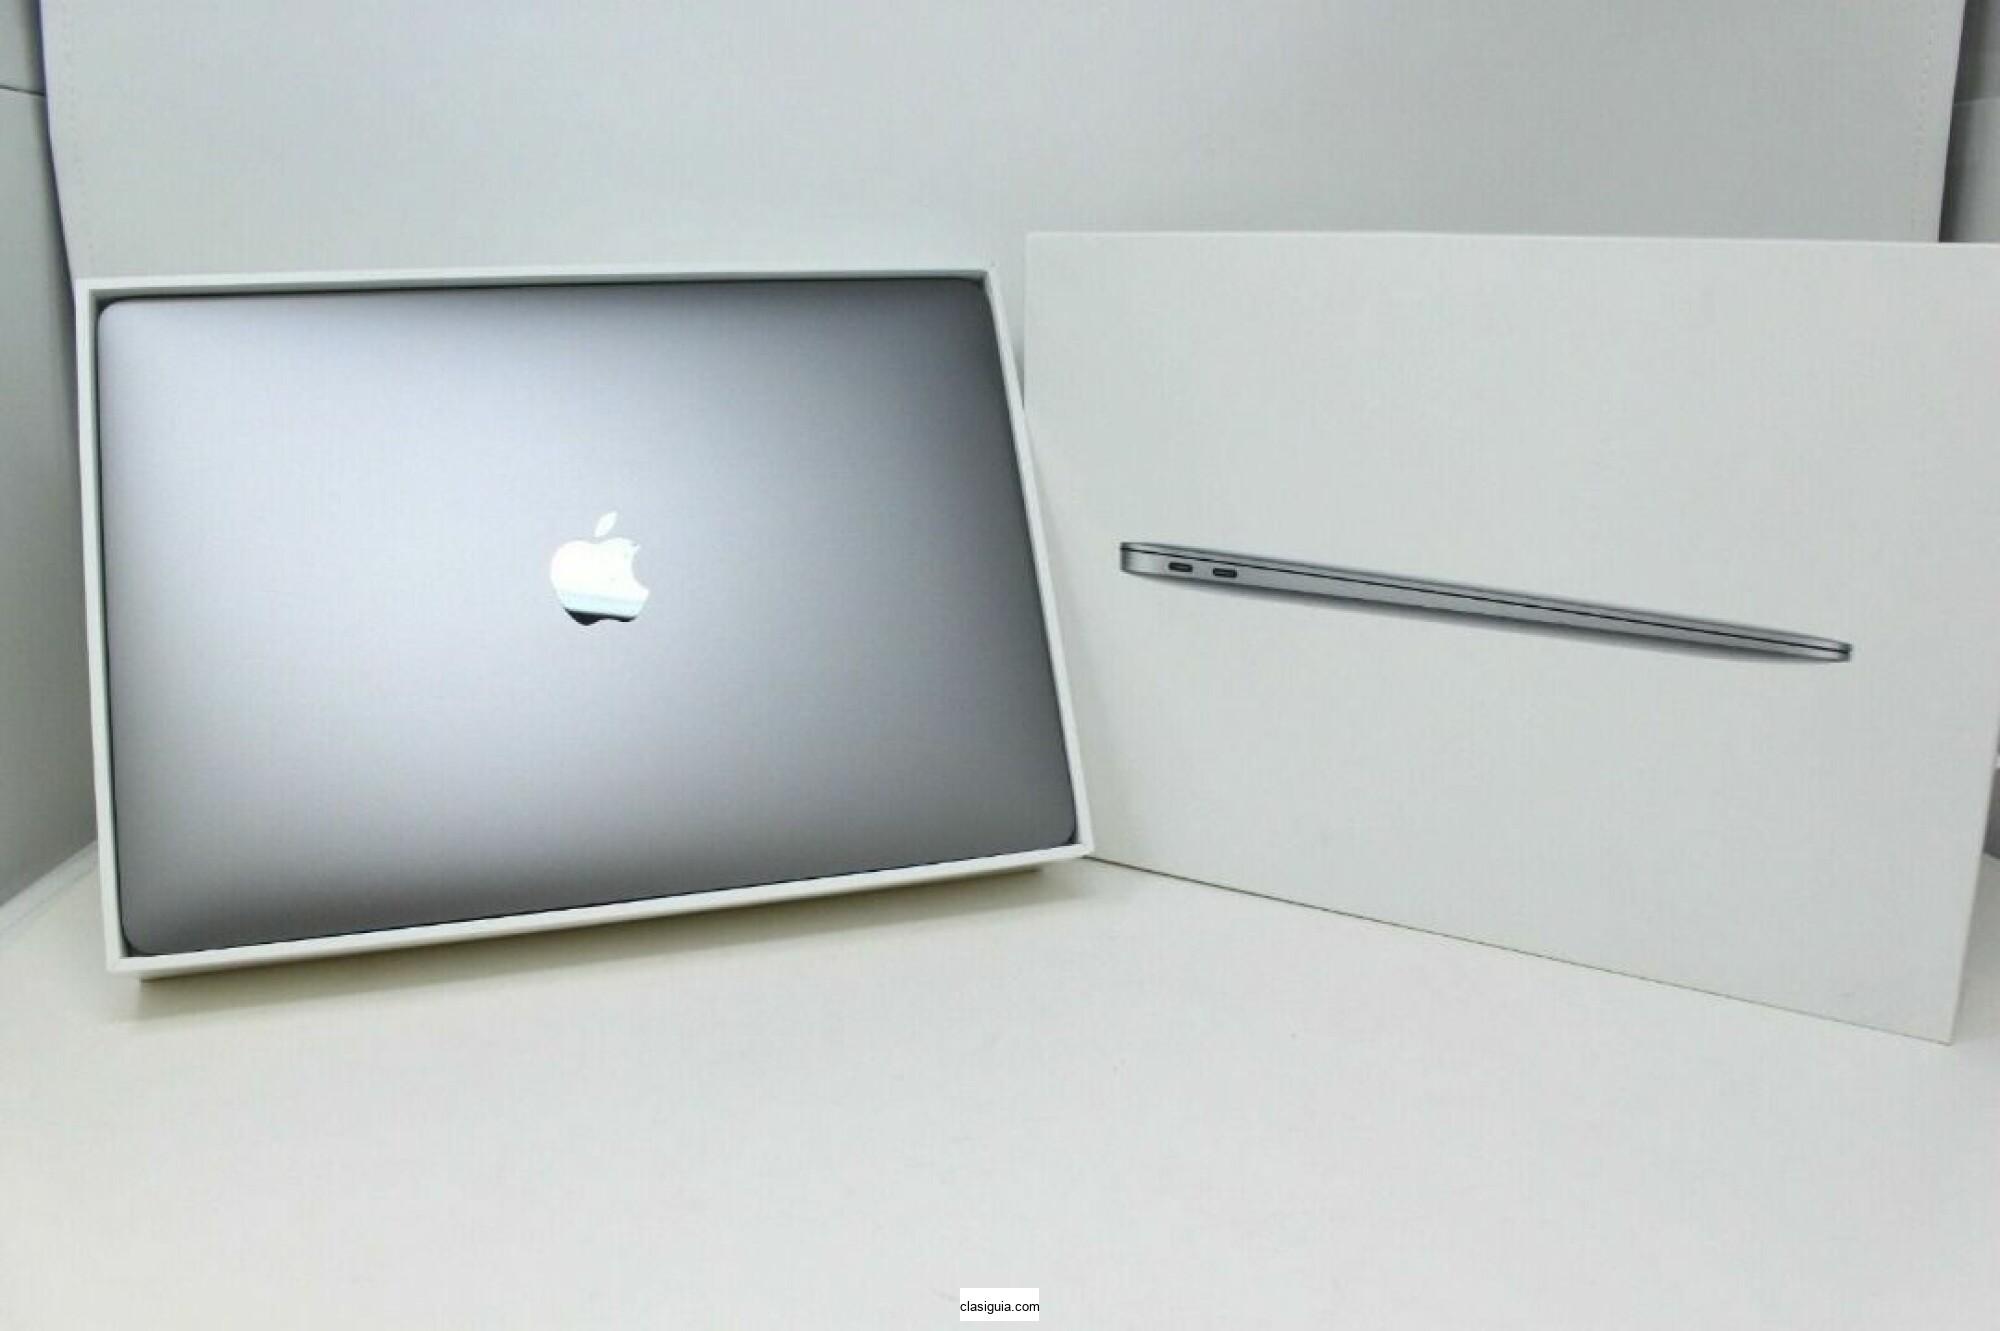 "Apple MacBook Air 13.3 ""(256 GB SSD, Intel Core i3 10th Gen., 3.20 GHz, 8 GB)"